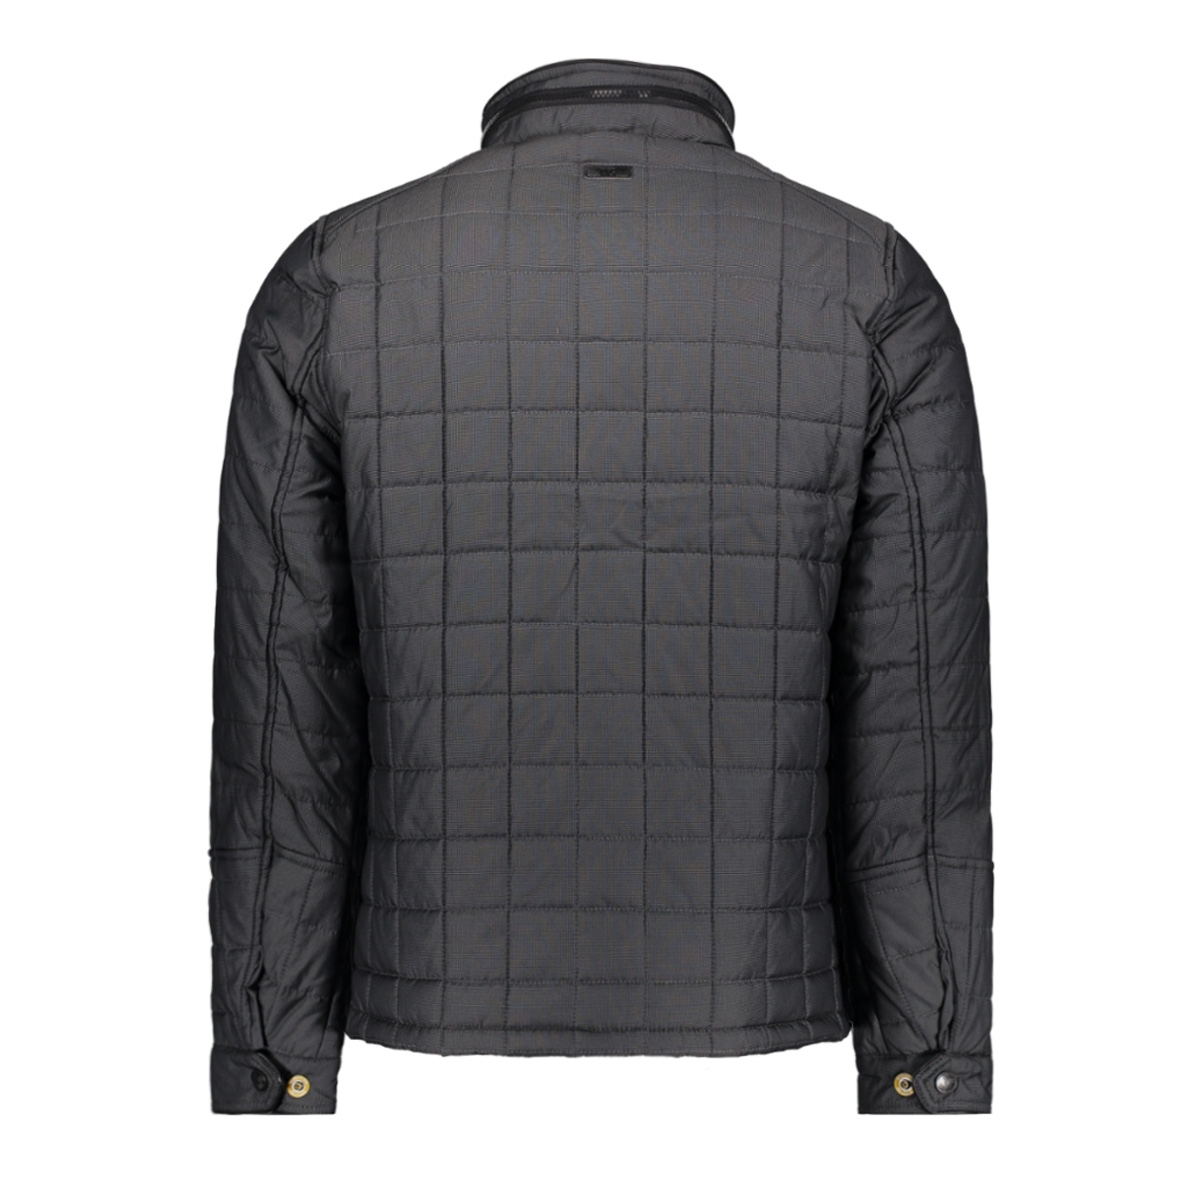 82630908 no-excess jas 020 black